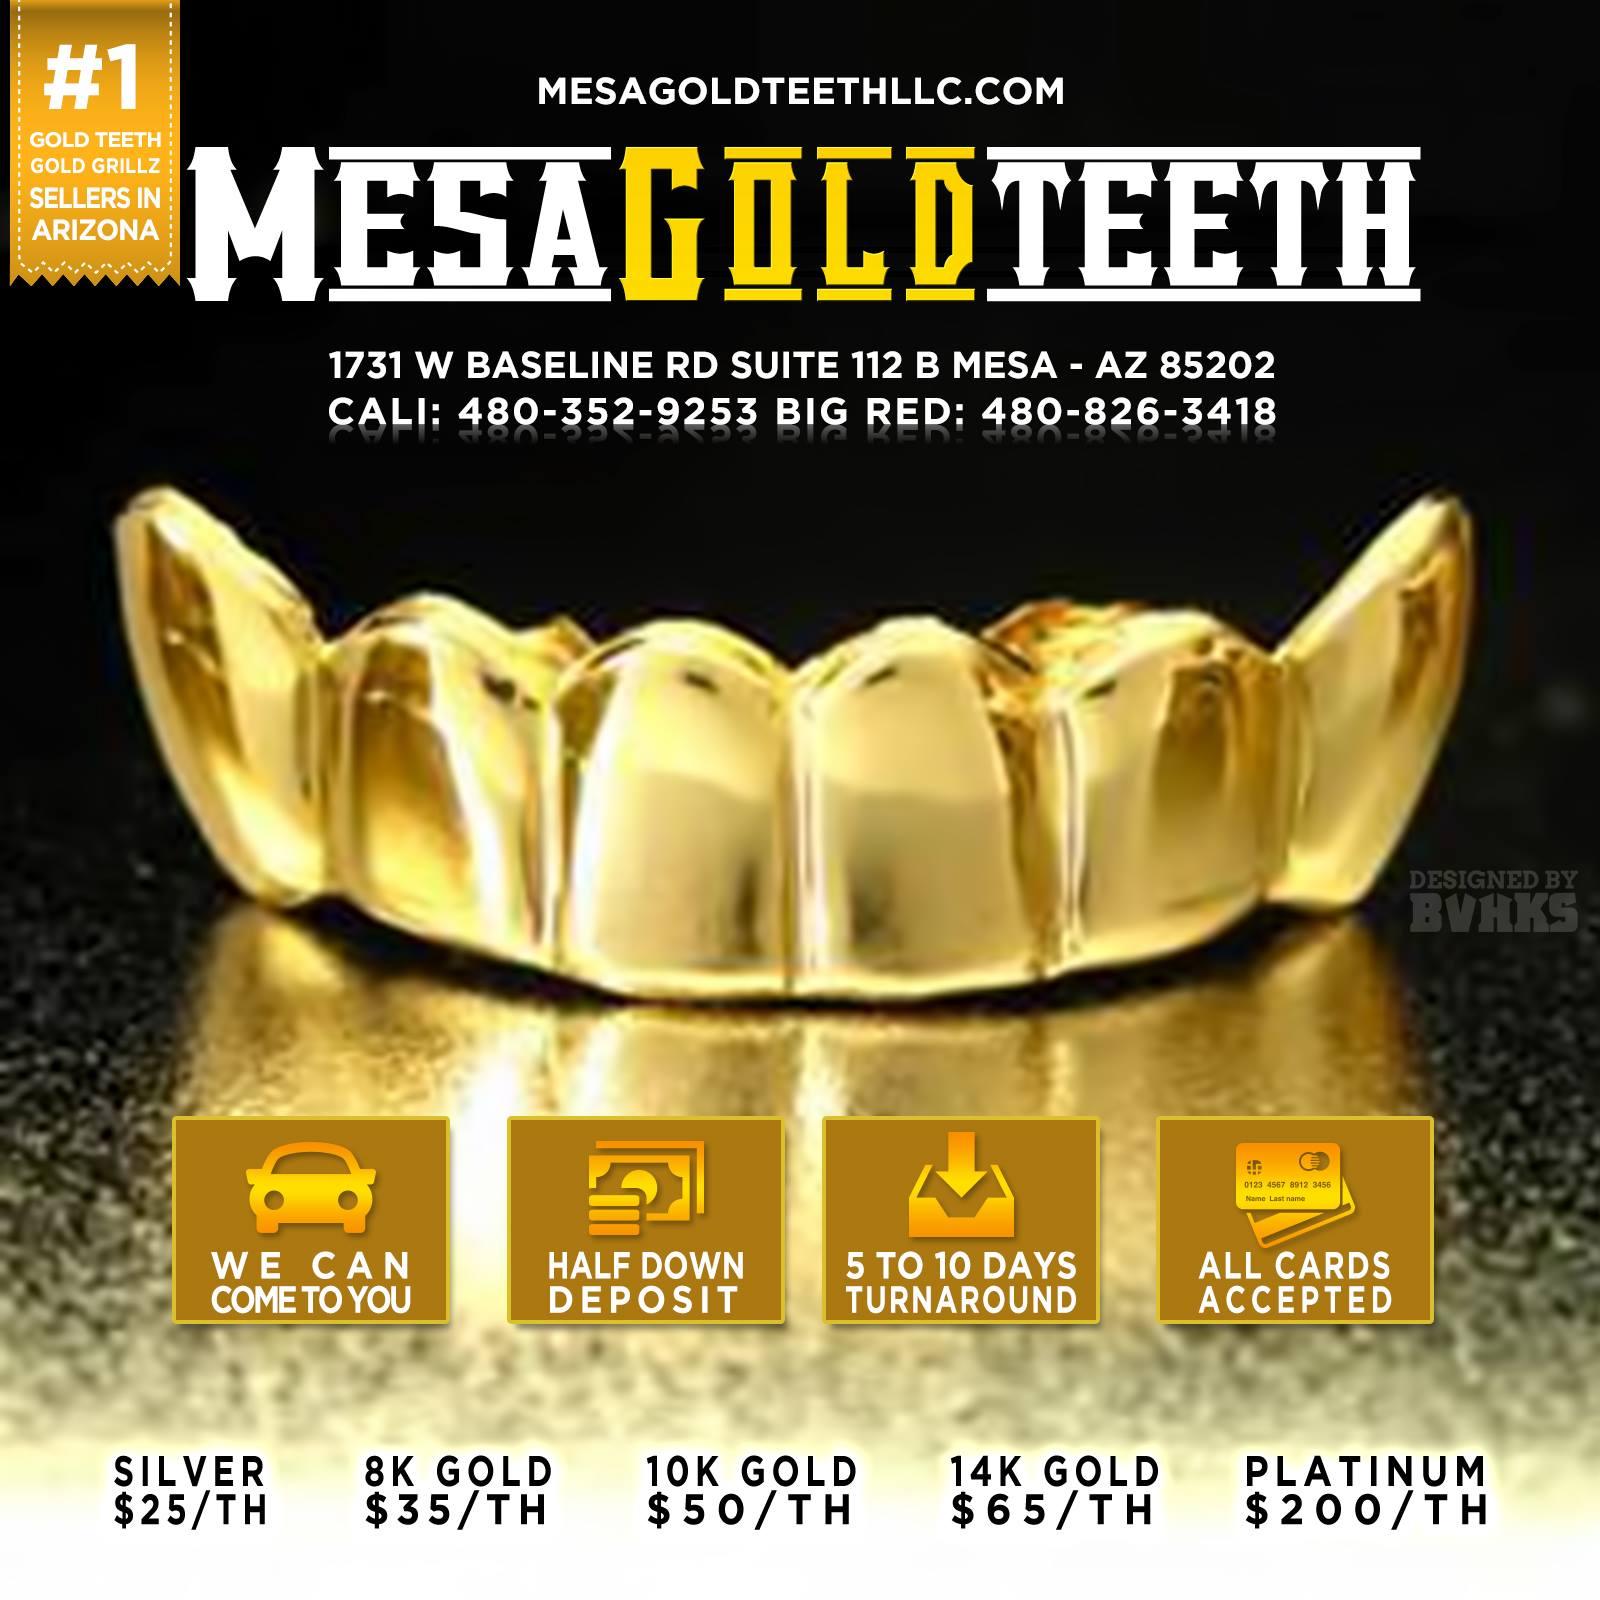 Mesa Gold Teeth LLC 1731 W Baseline Rd Suite 112B, Mesa, AZ 85202